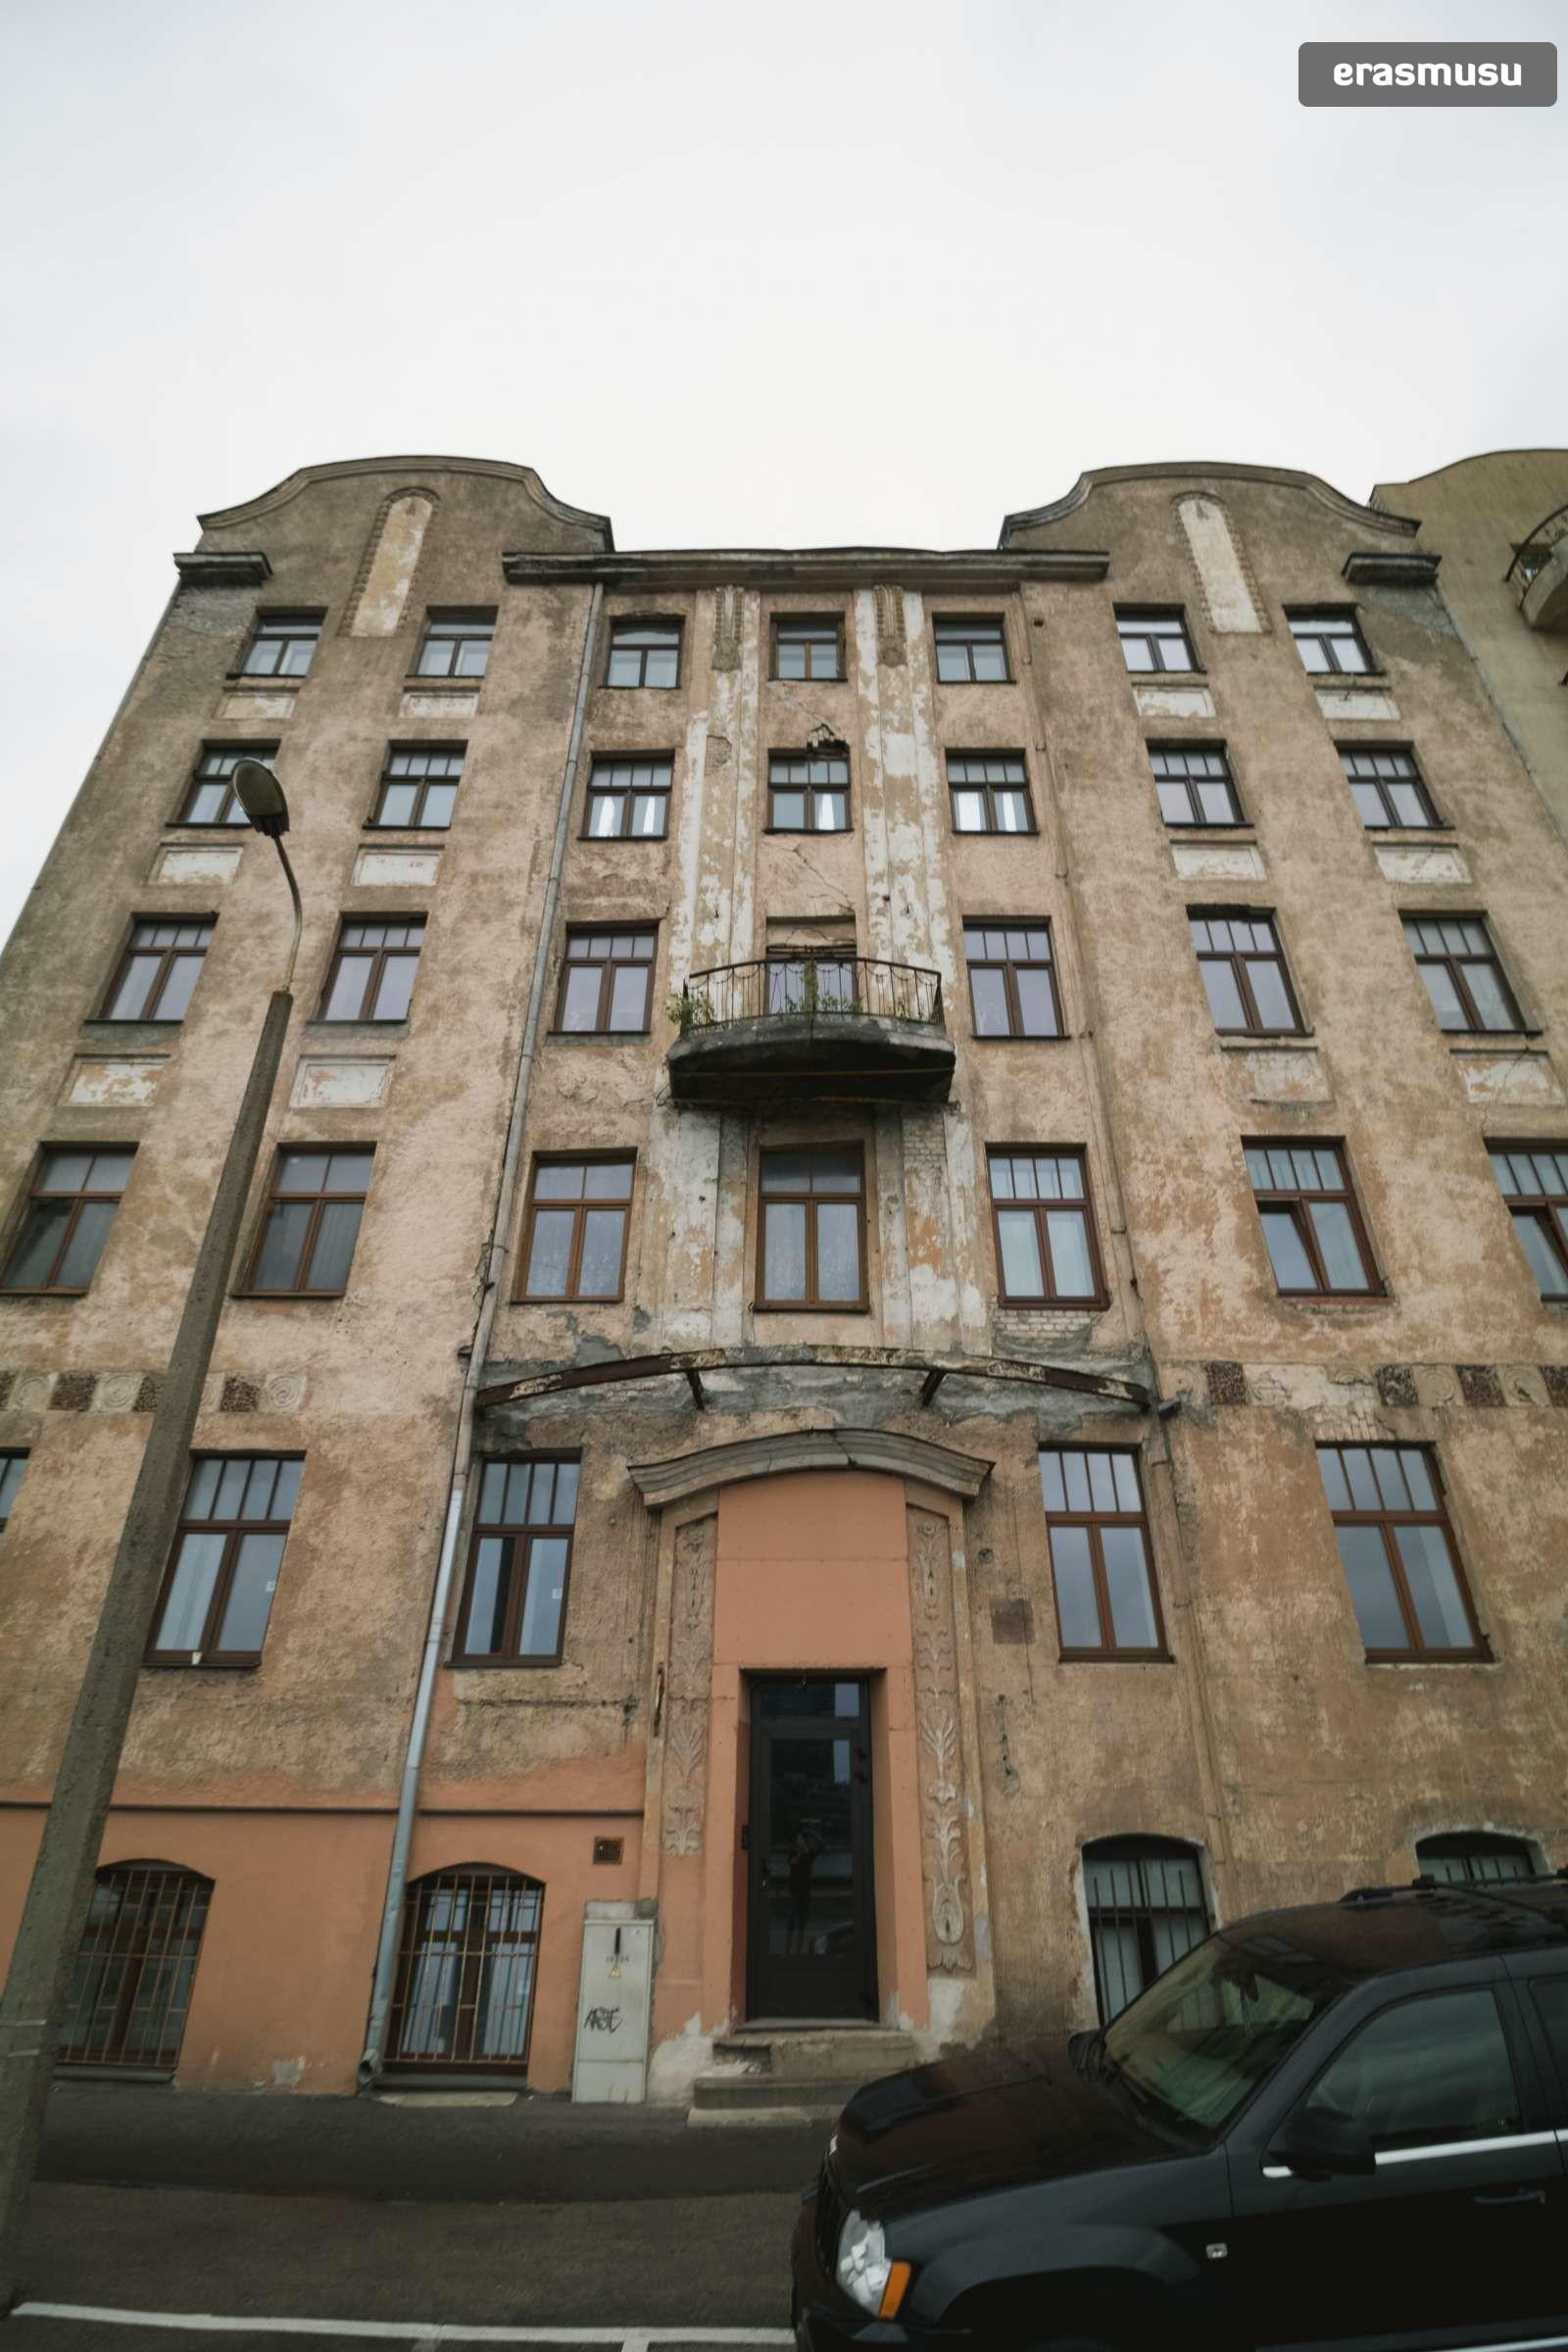 stylish-2-bedroom-apartment-rent-maskavas-forstate-397d8c08e583b